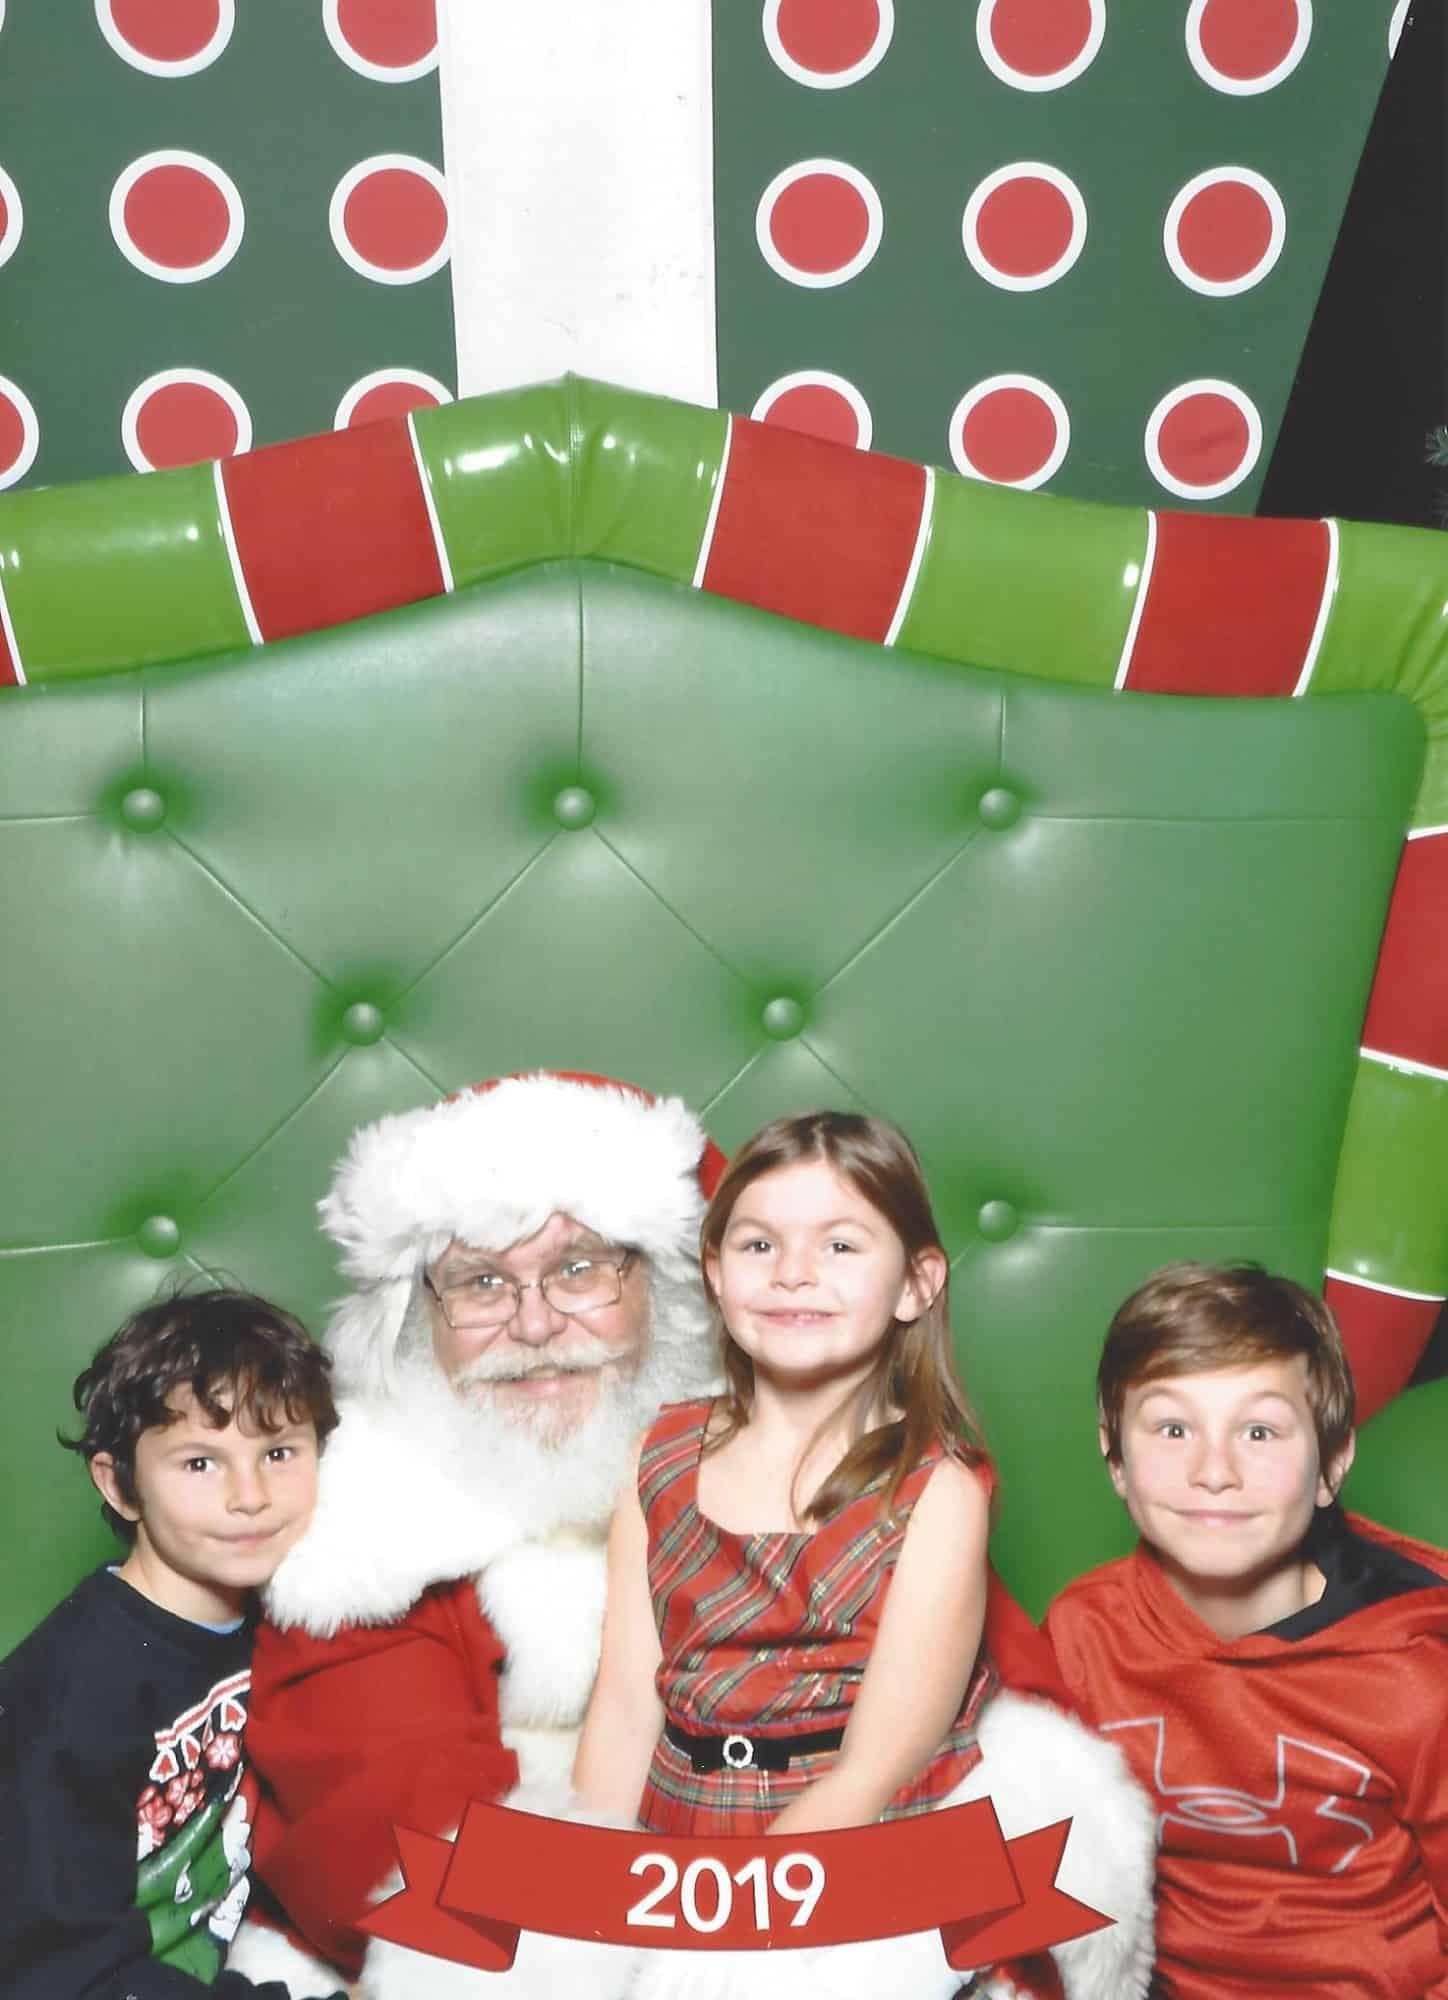 Shoppers World Brampton Santa Photo Set up